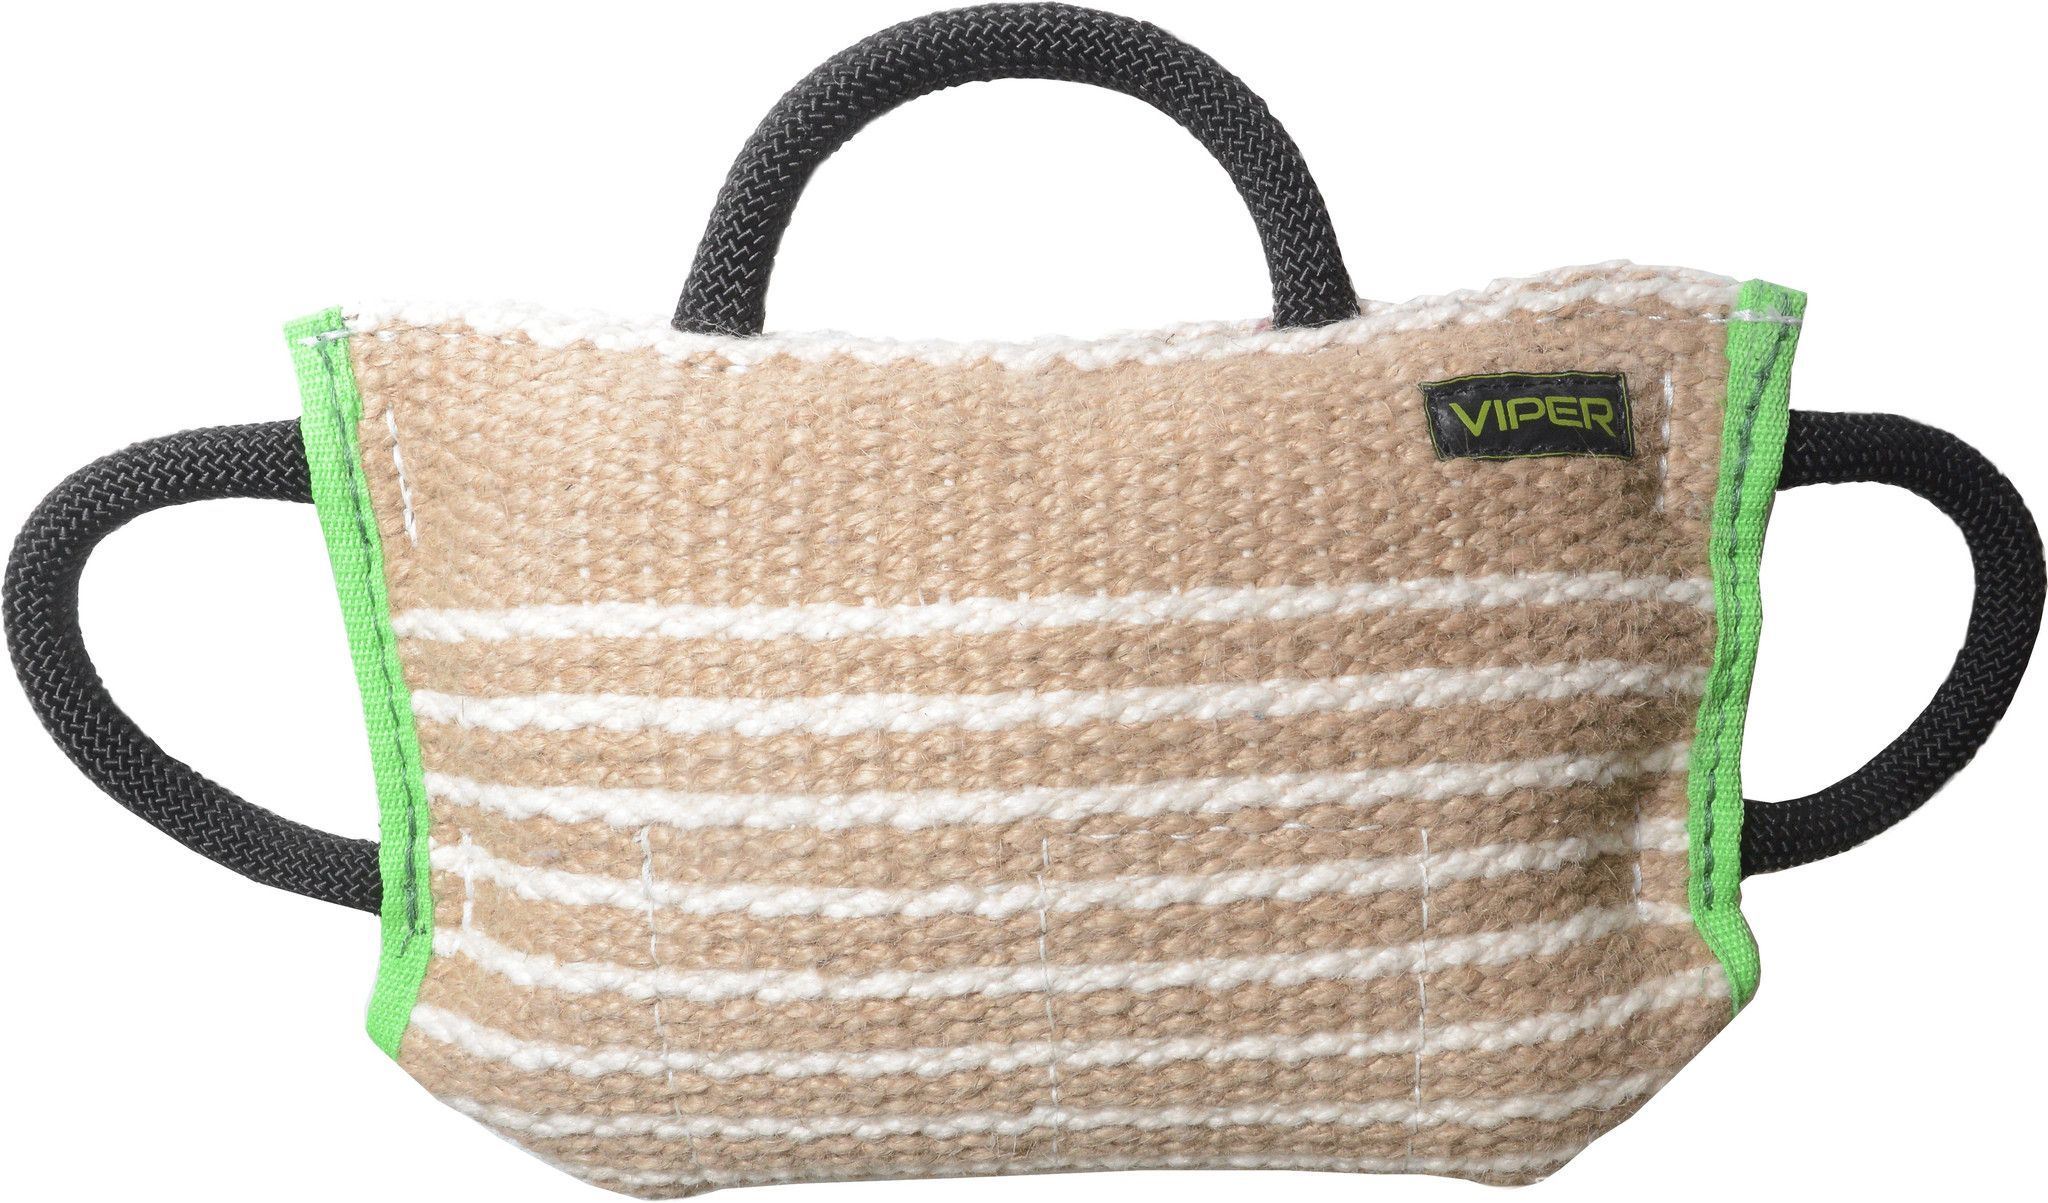 Viper Classic Jute Bite Pillow